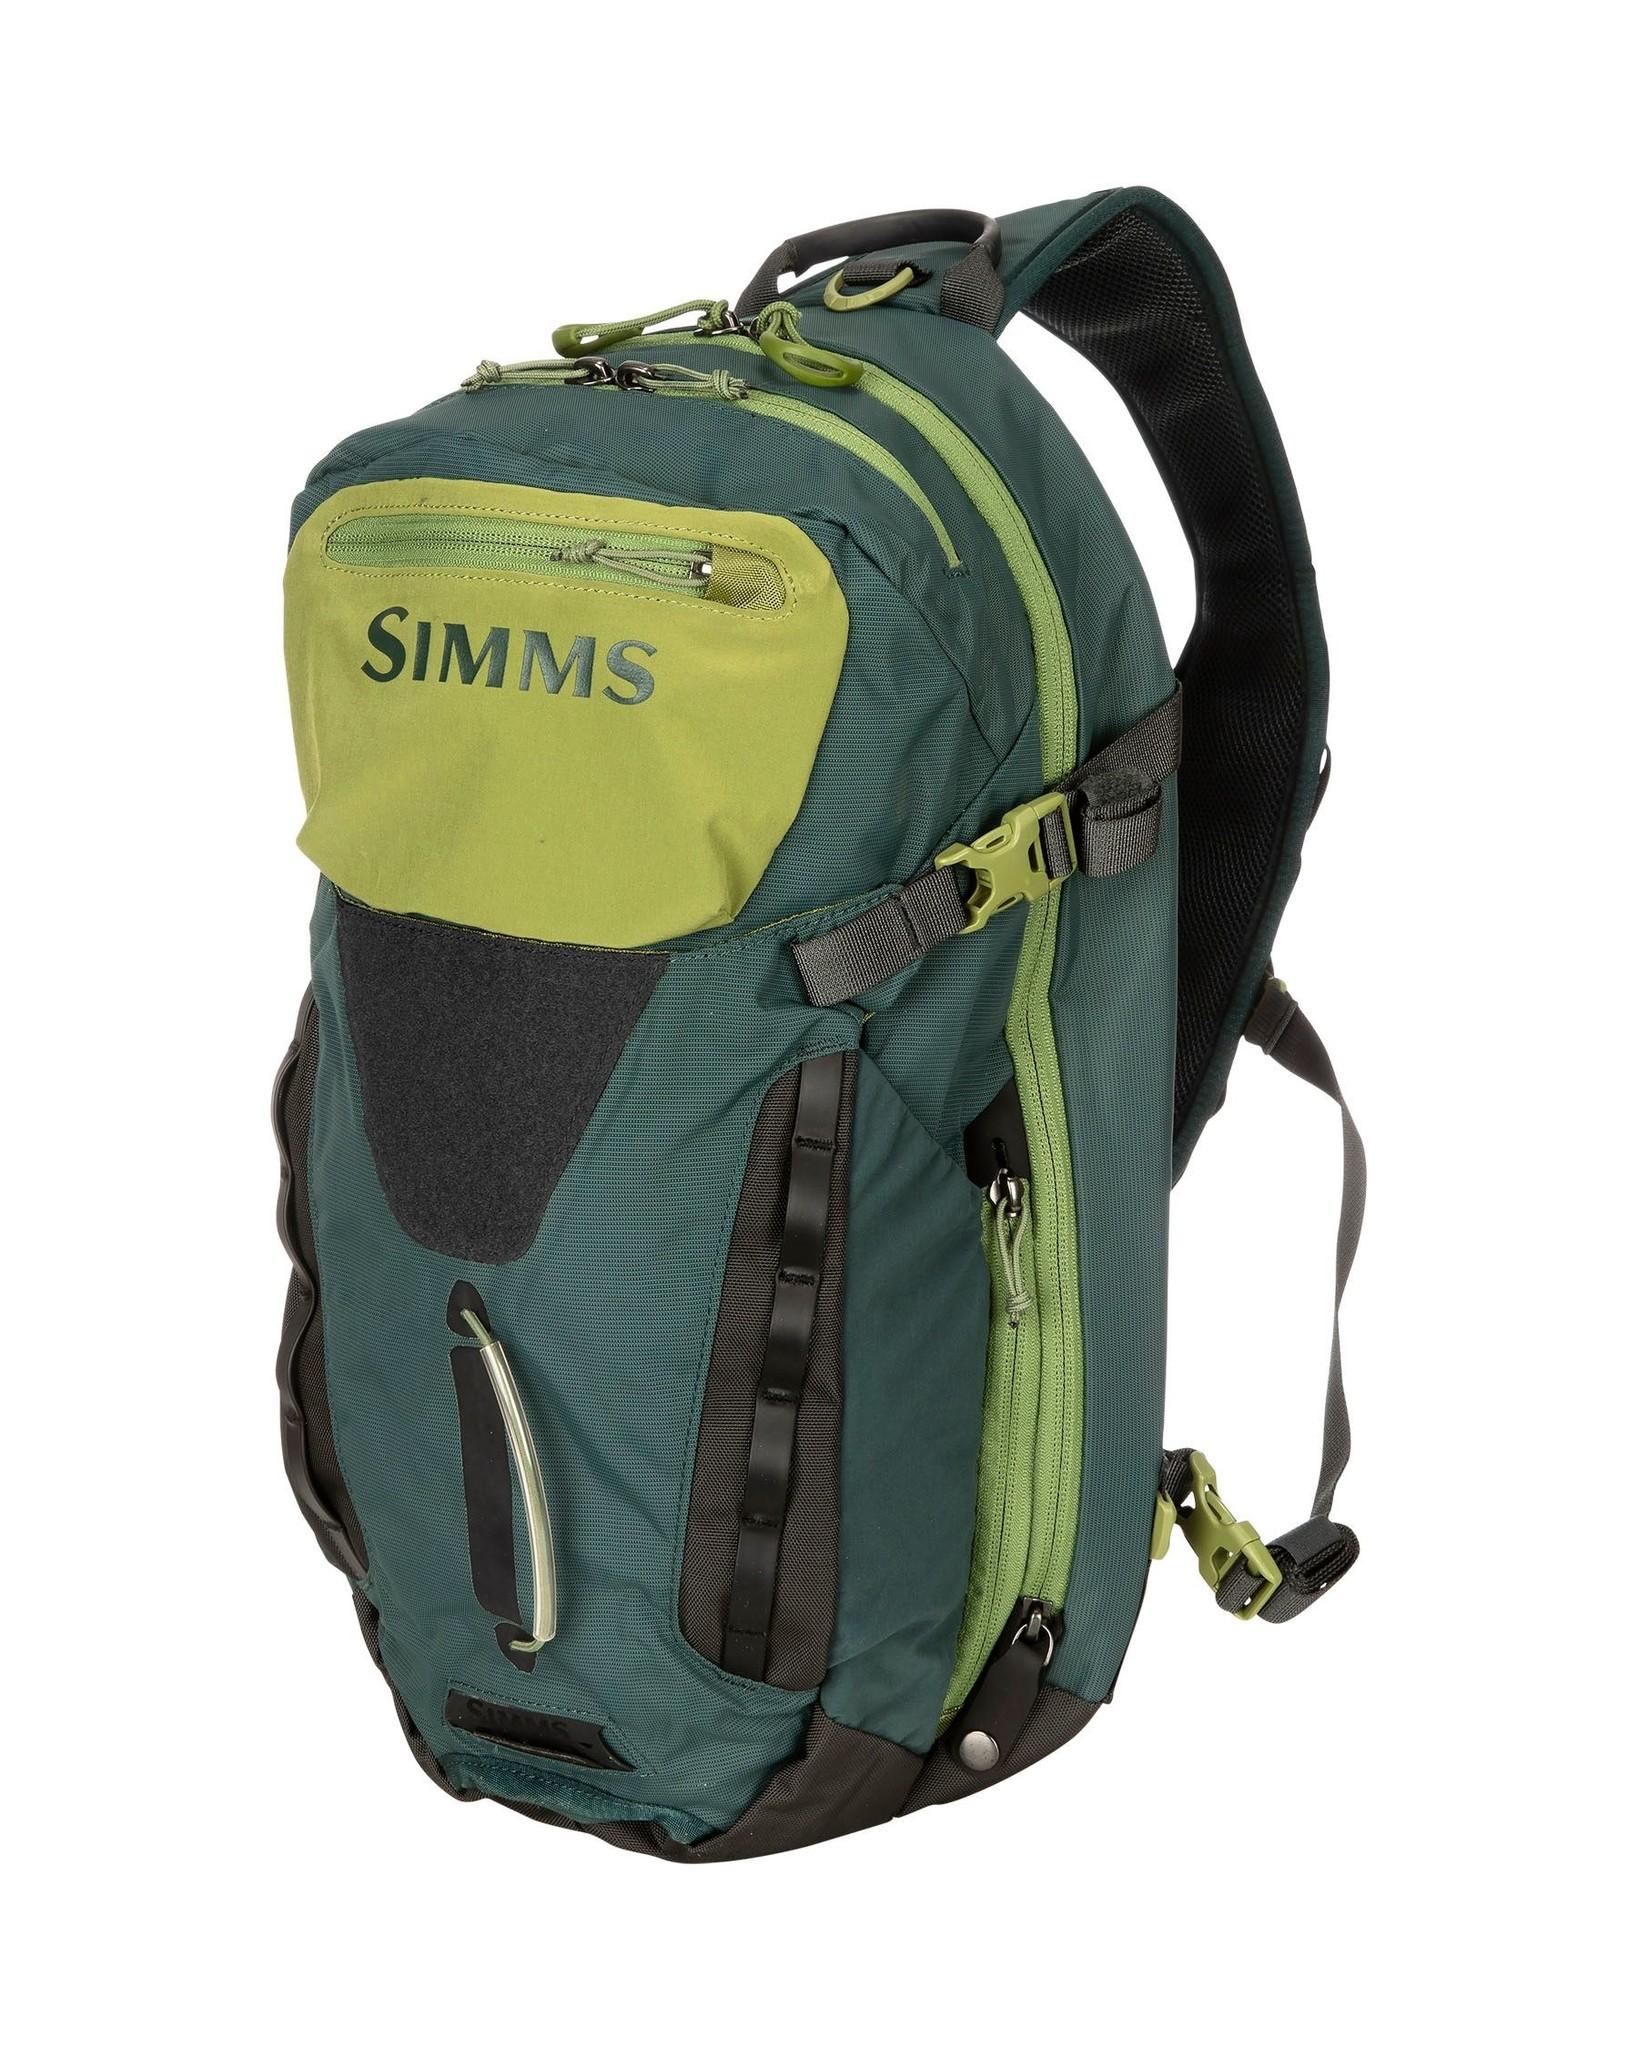 SIMMS SIMMS FREESTONE AMBI SLING - SHADOW GREEN - ON SALE!!!